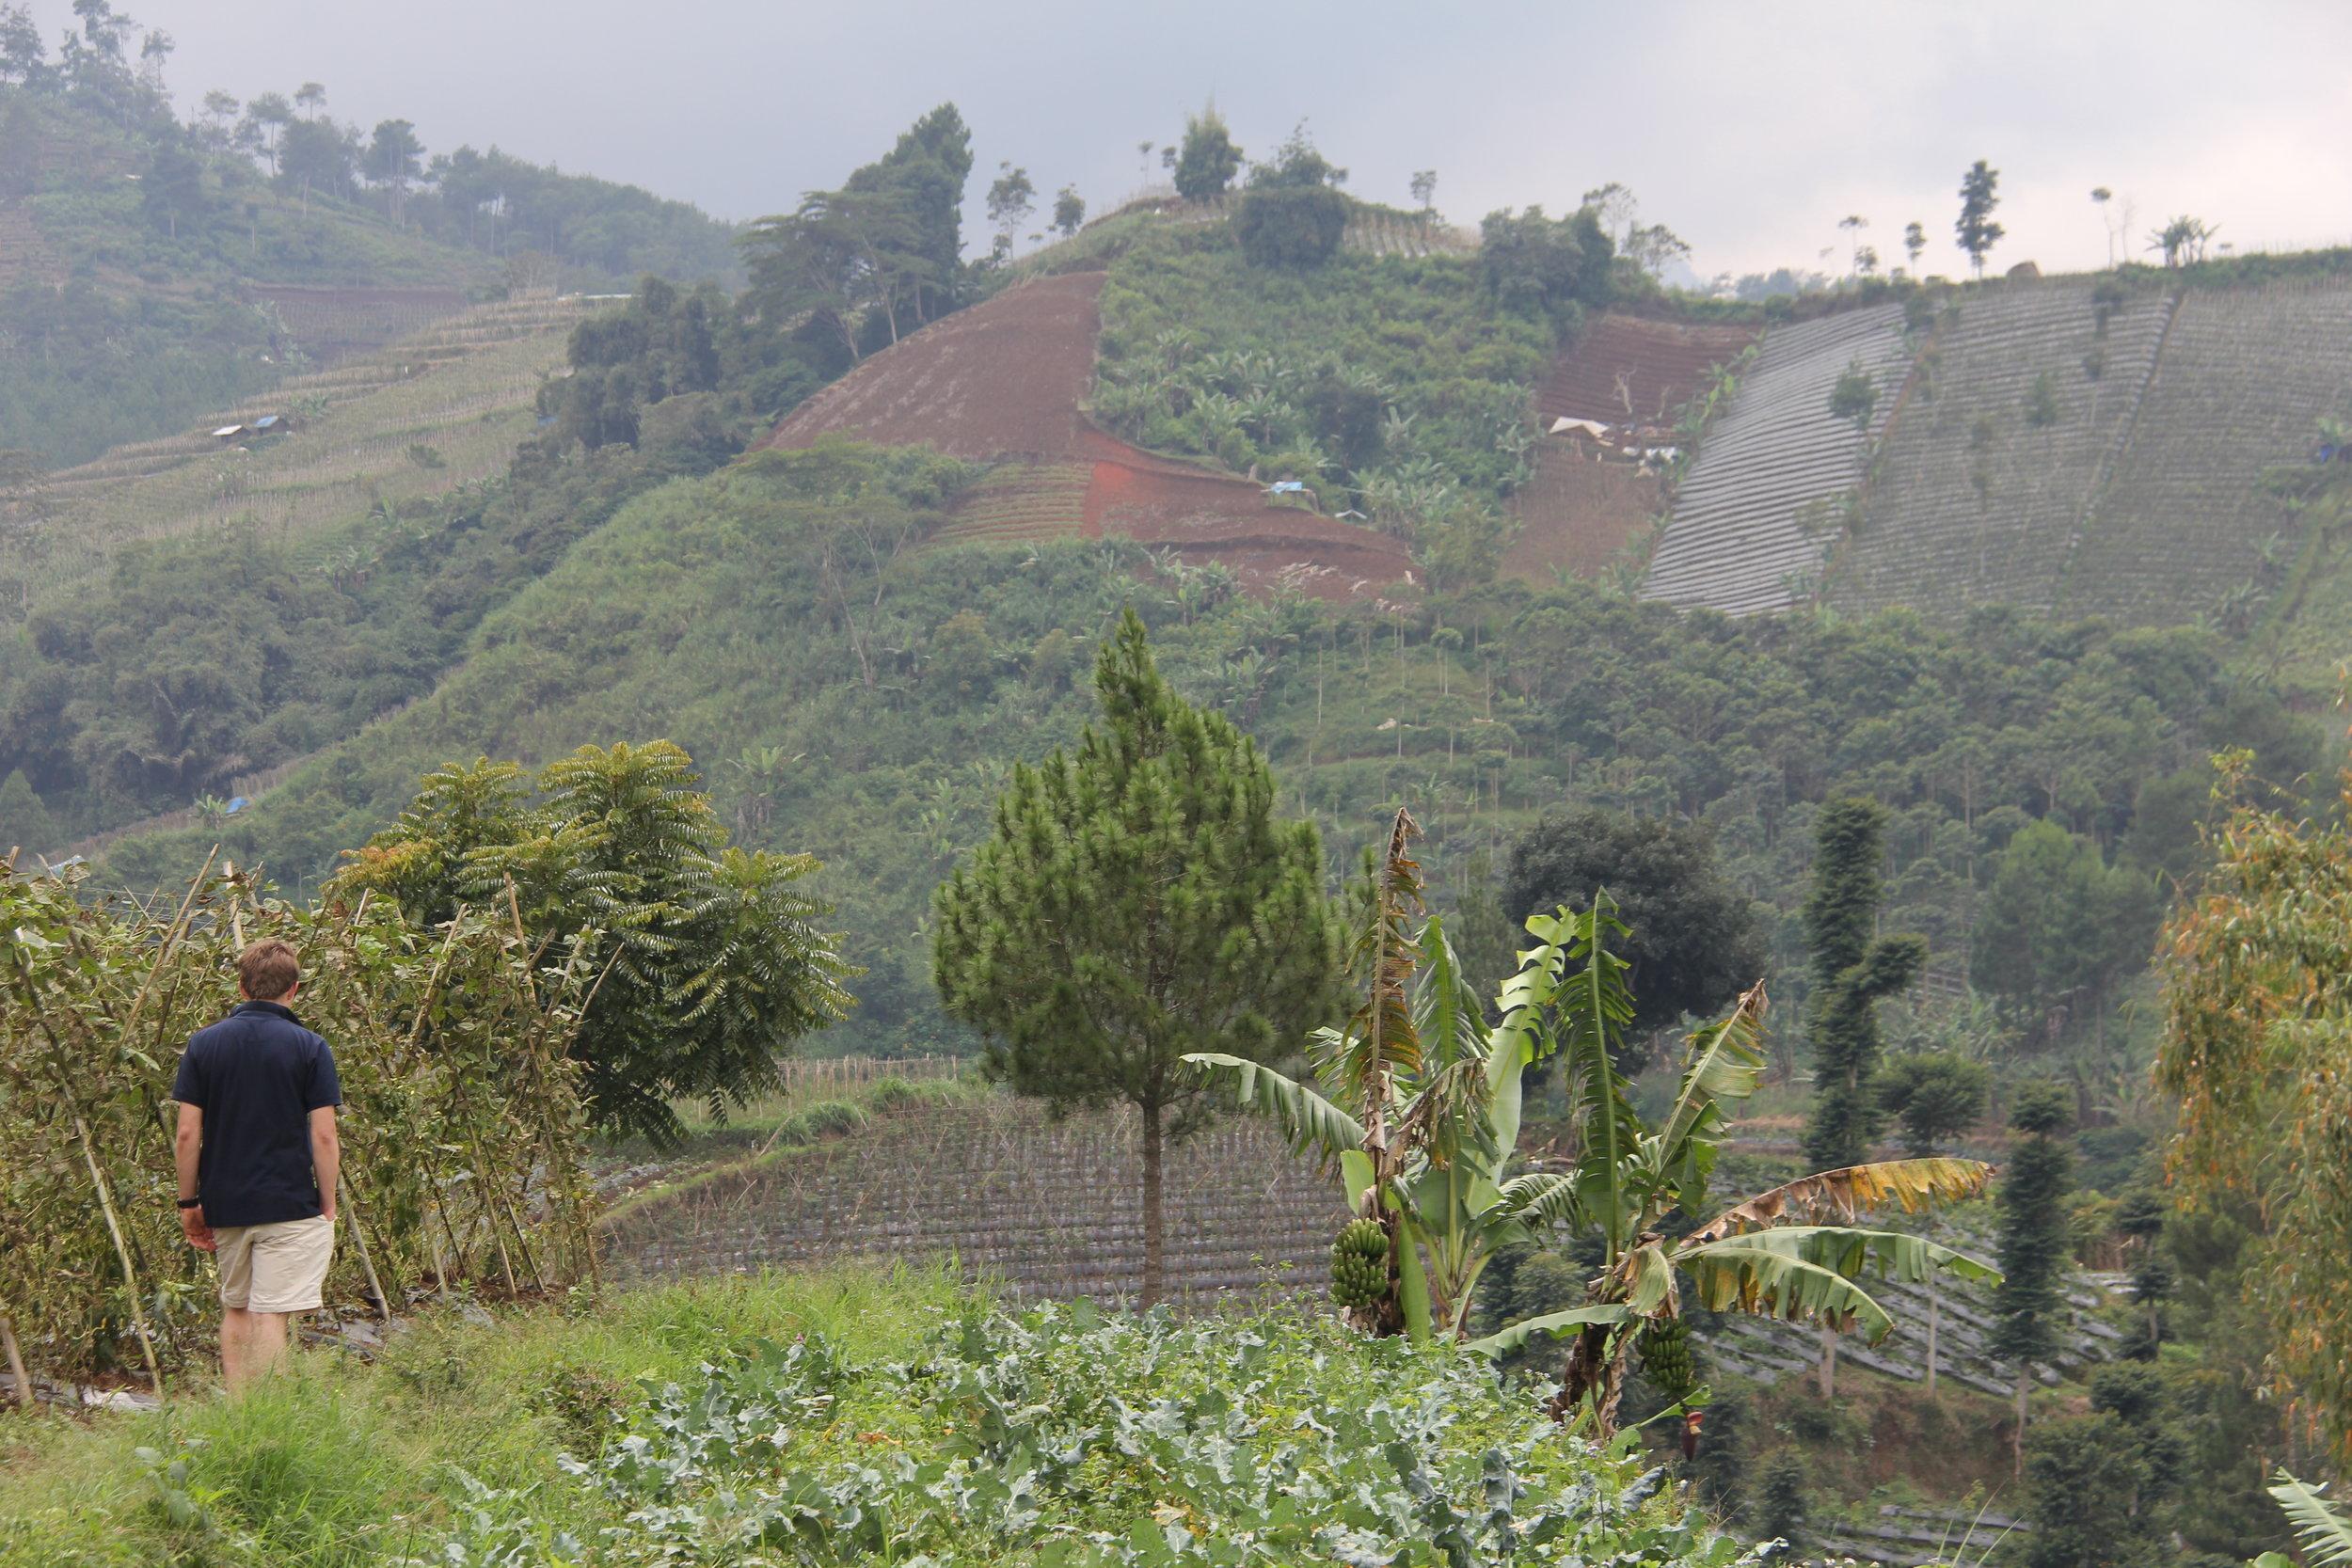 Mountainous farming area of Bandung Indonesia called Lembang